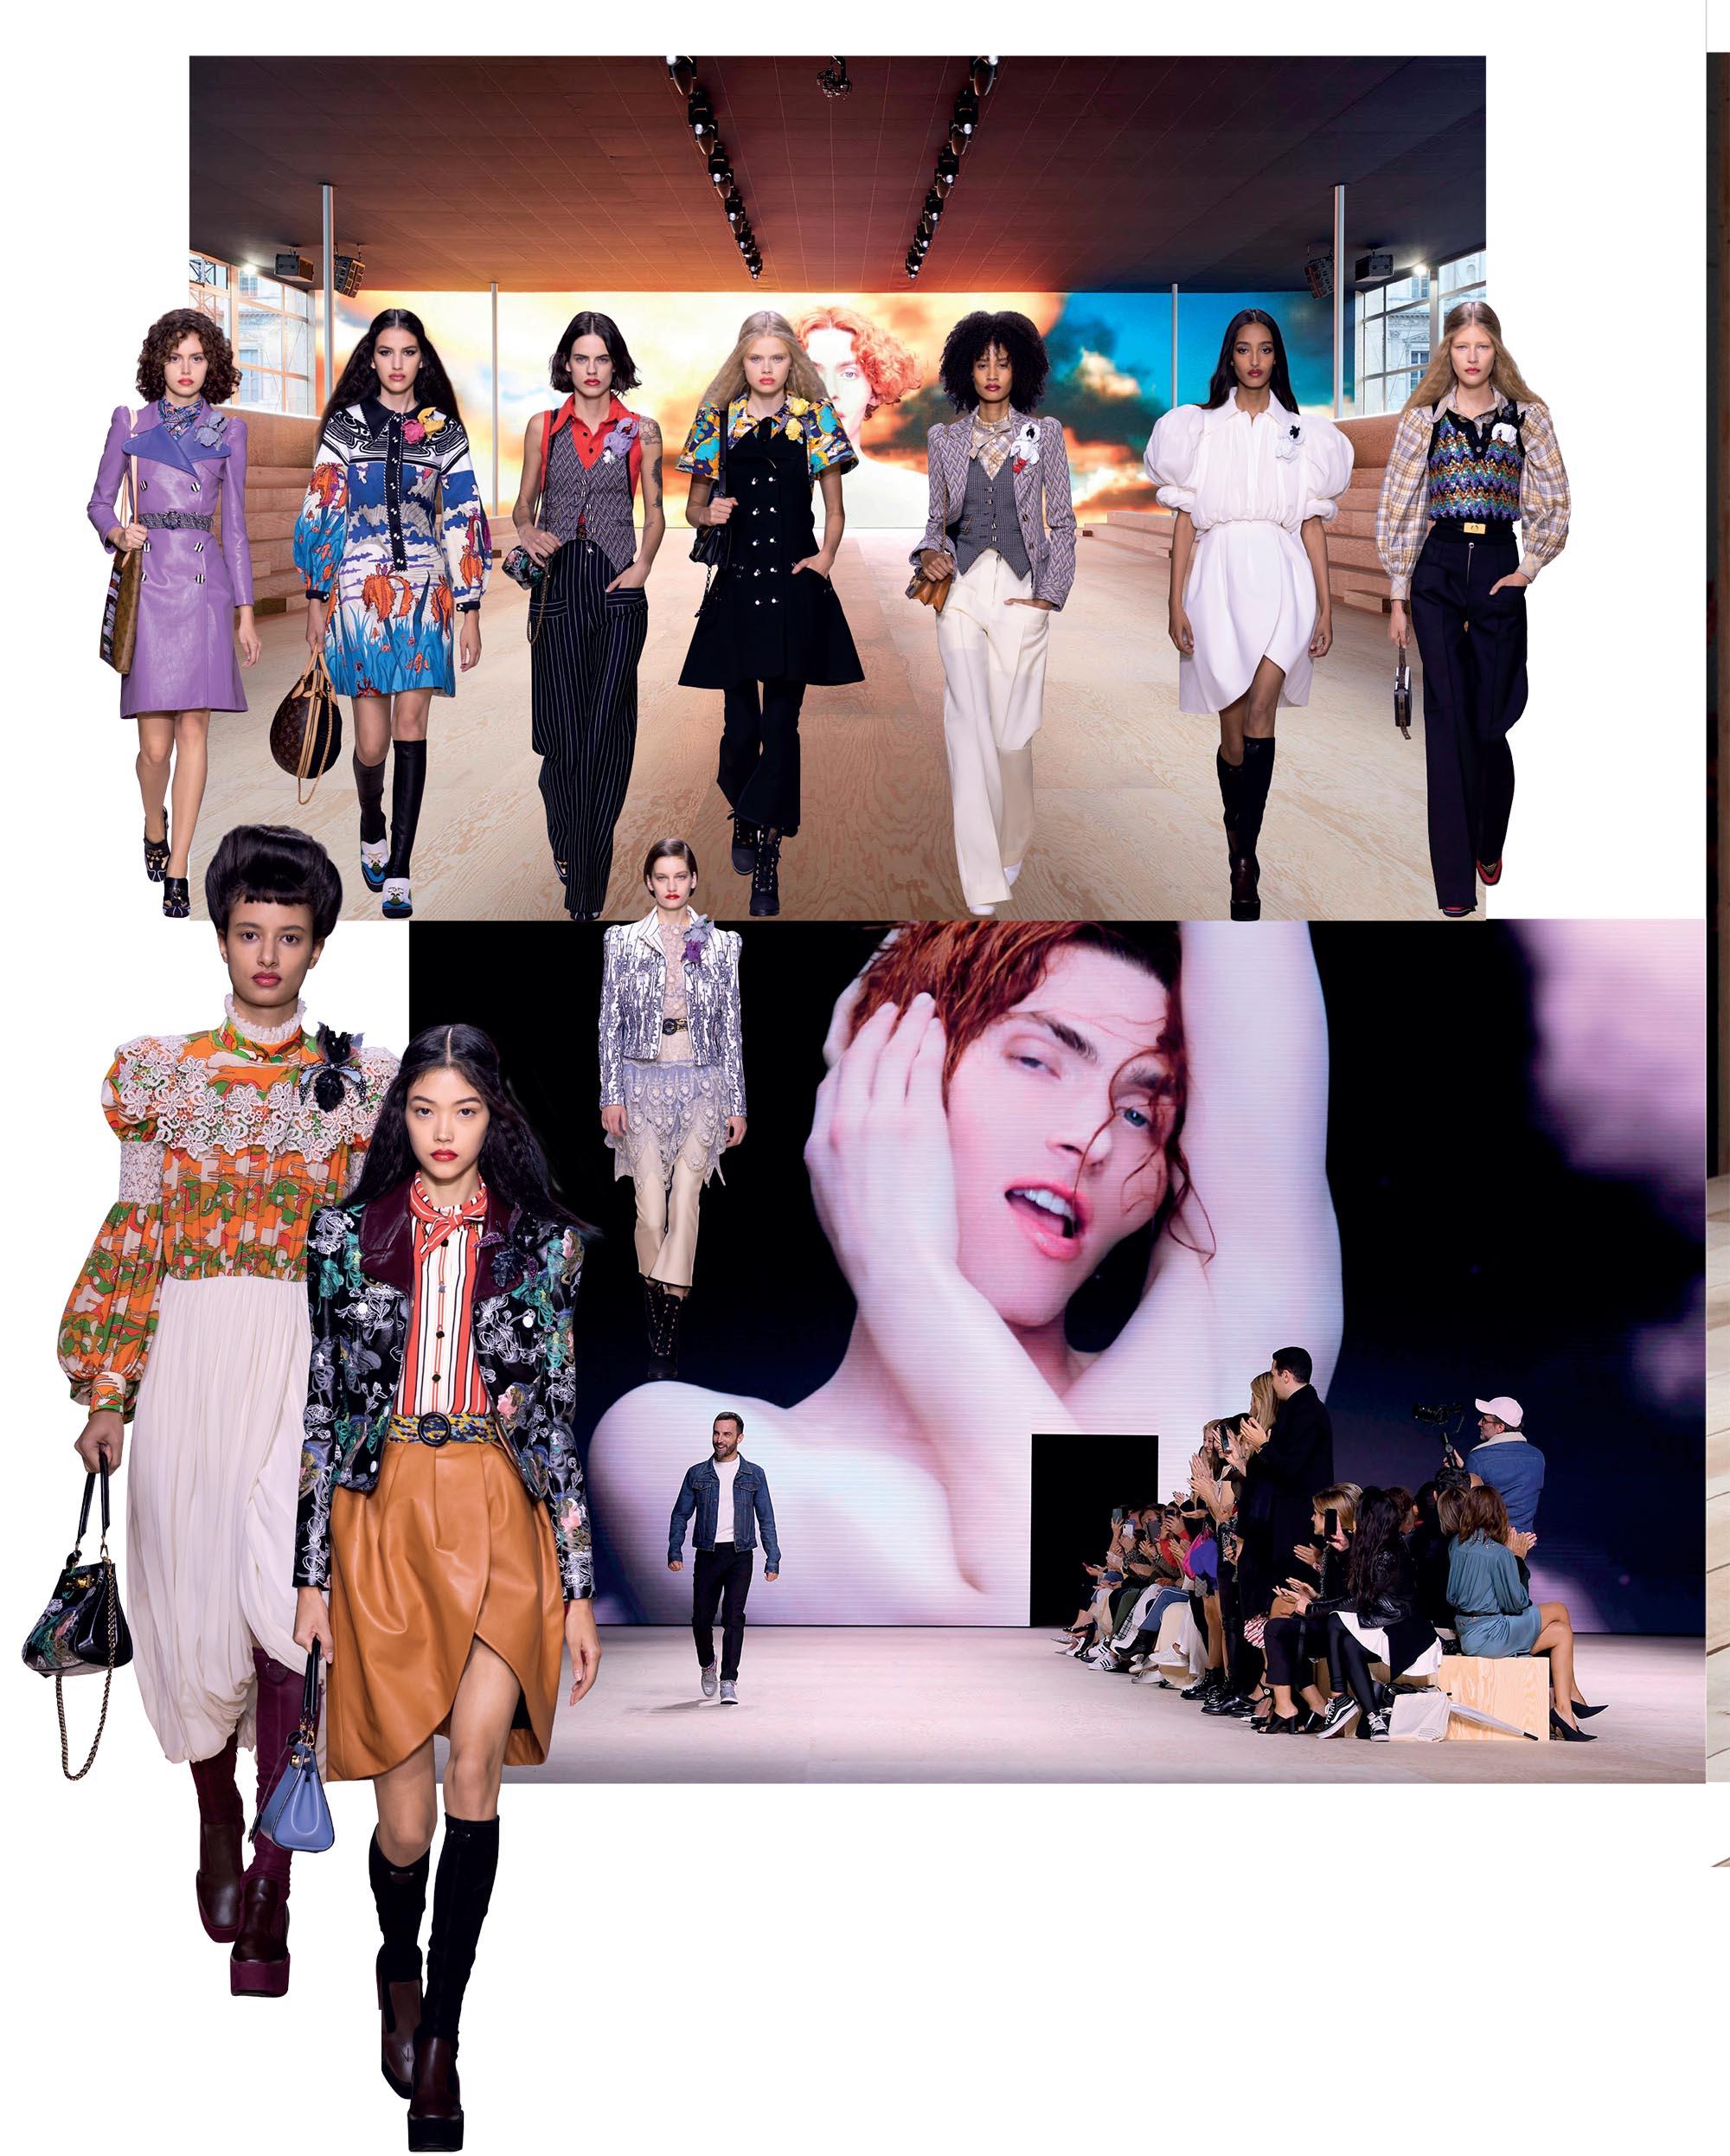 bst thời trang Xuân Hè 2020 Louis Vuitton